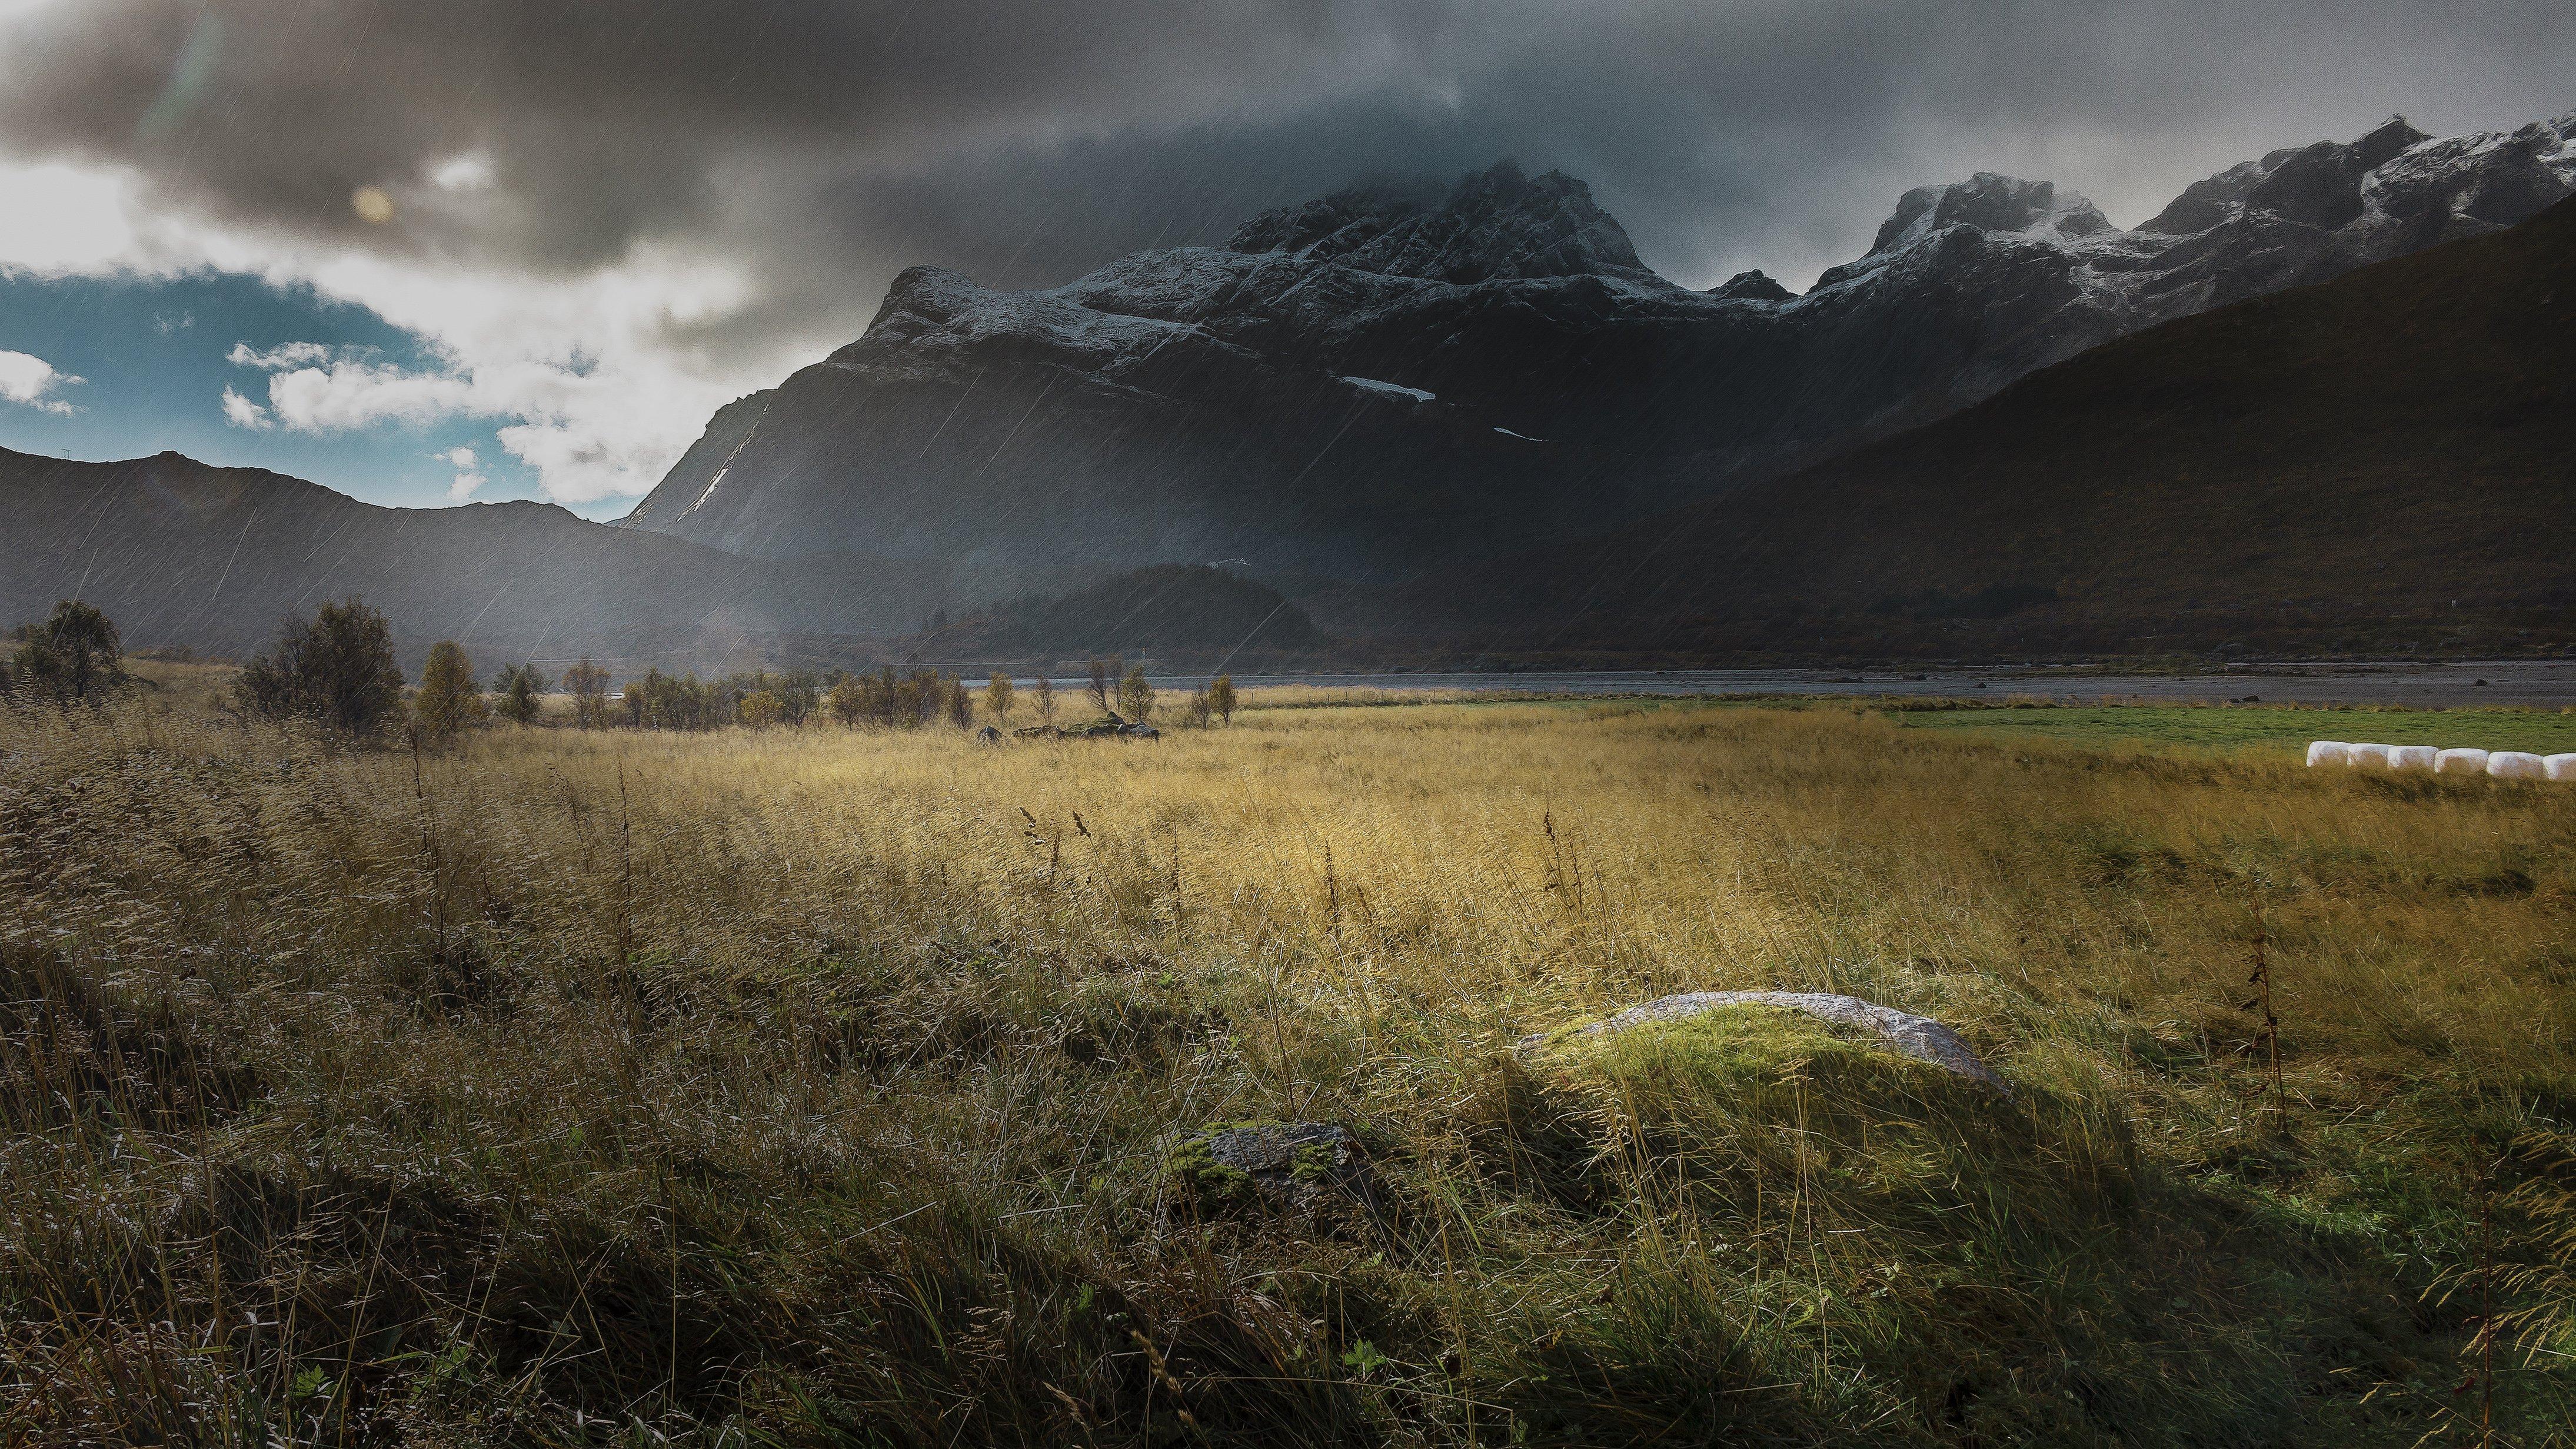 8k Rain Couple Wallpaper: Norway Wallpapers And Desktop Backgrounds Up To 8K